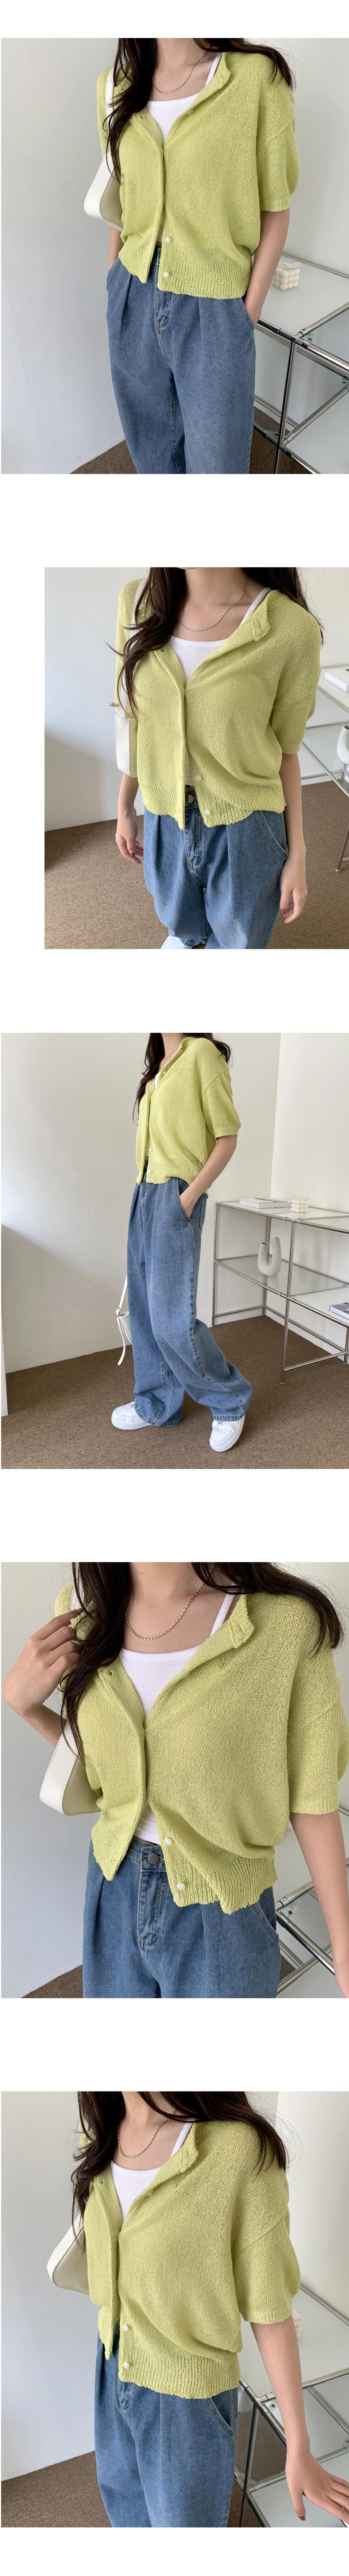 Randy Bookle Round Short Sleeve Knitwear Cardigan